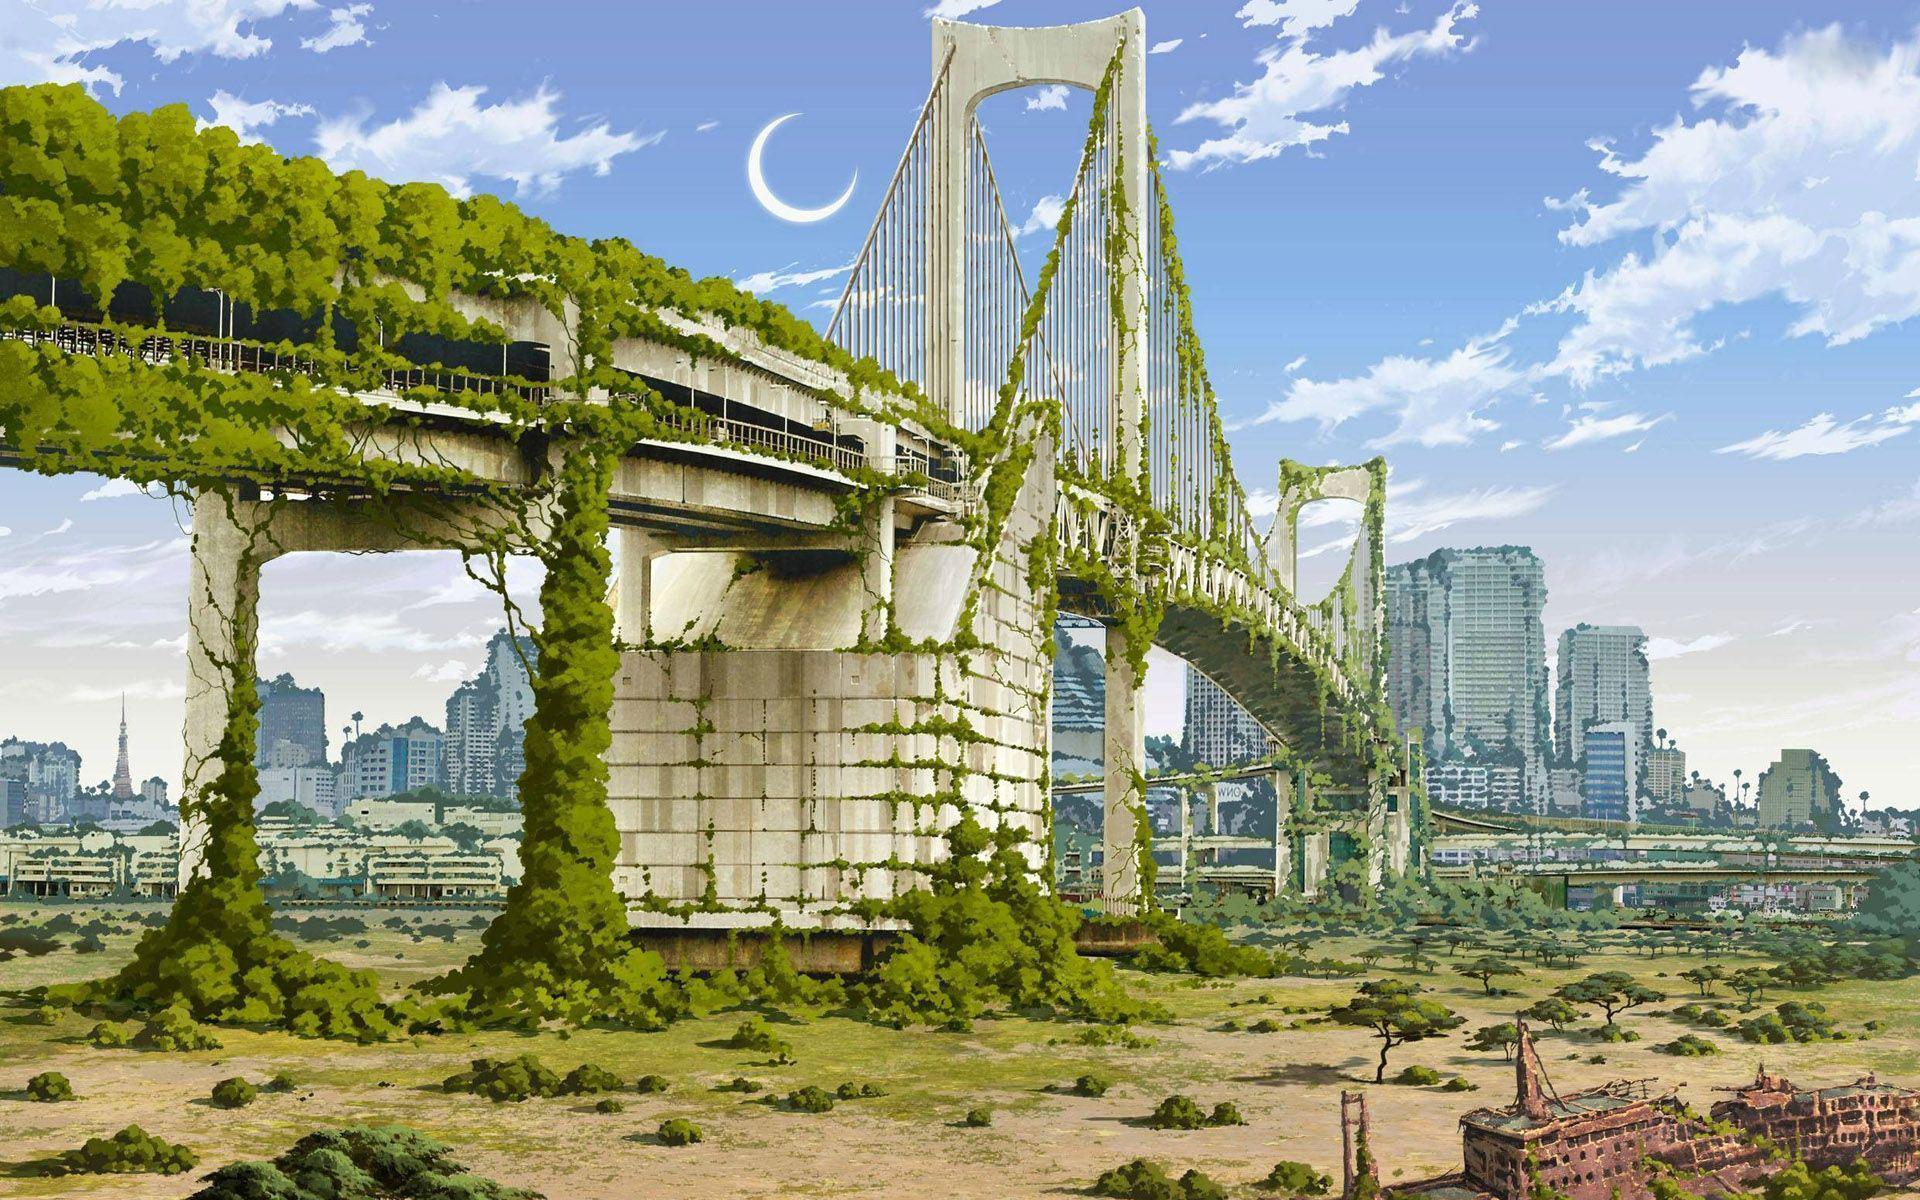 Post apocalyptic vikinglifeblog - Fantasy wallpaper bridge ...